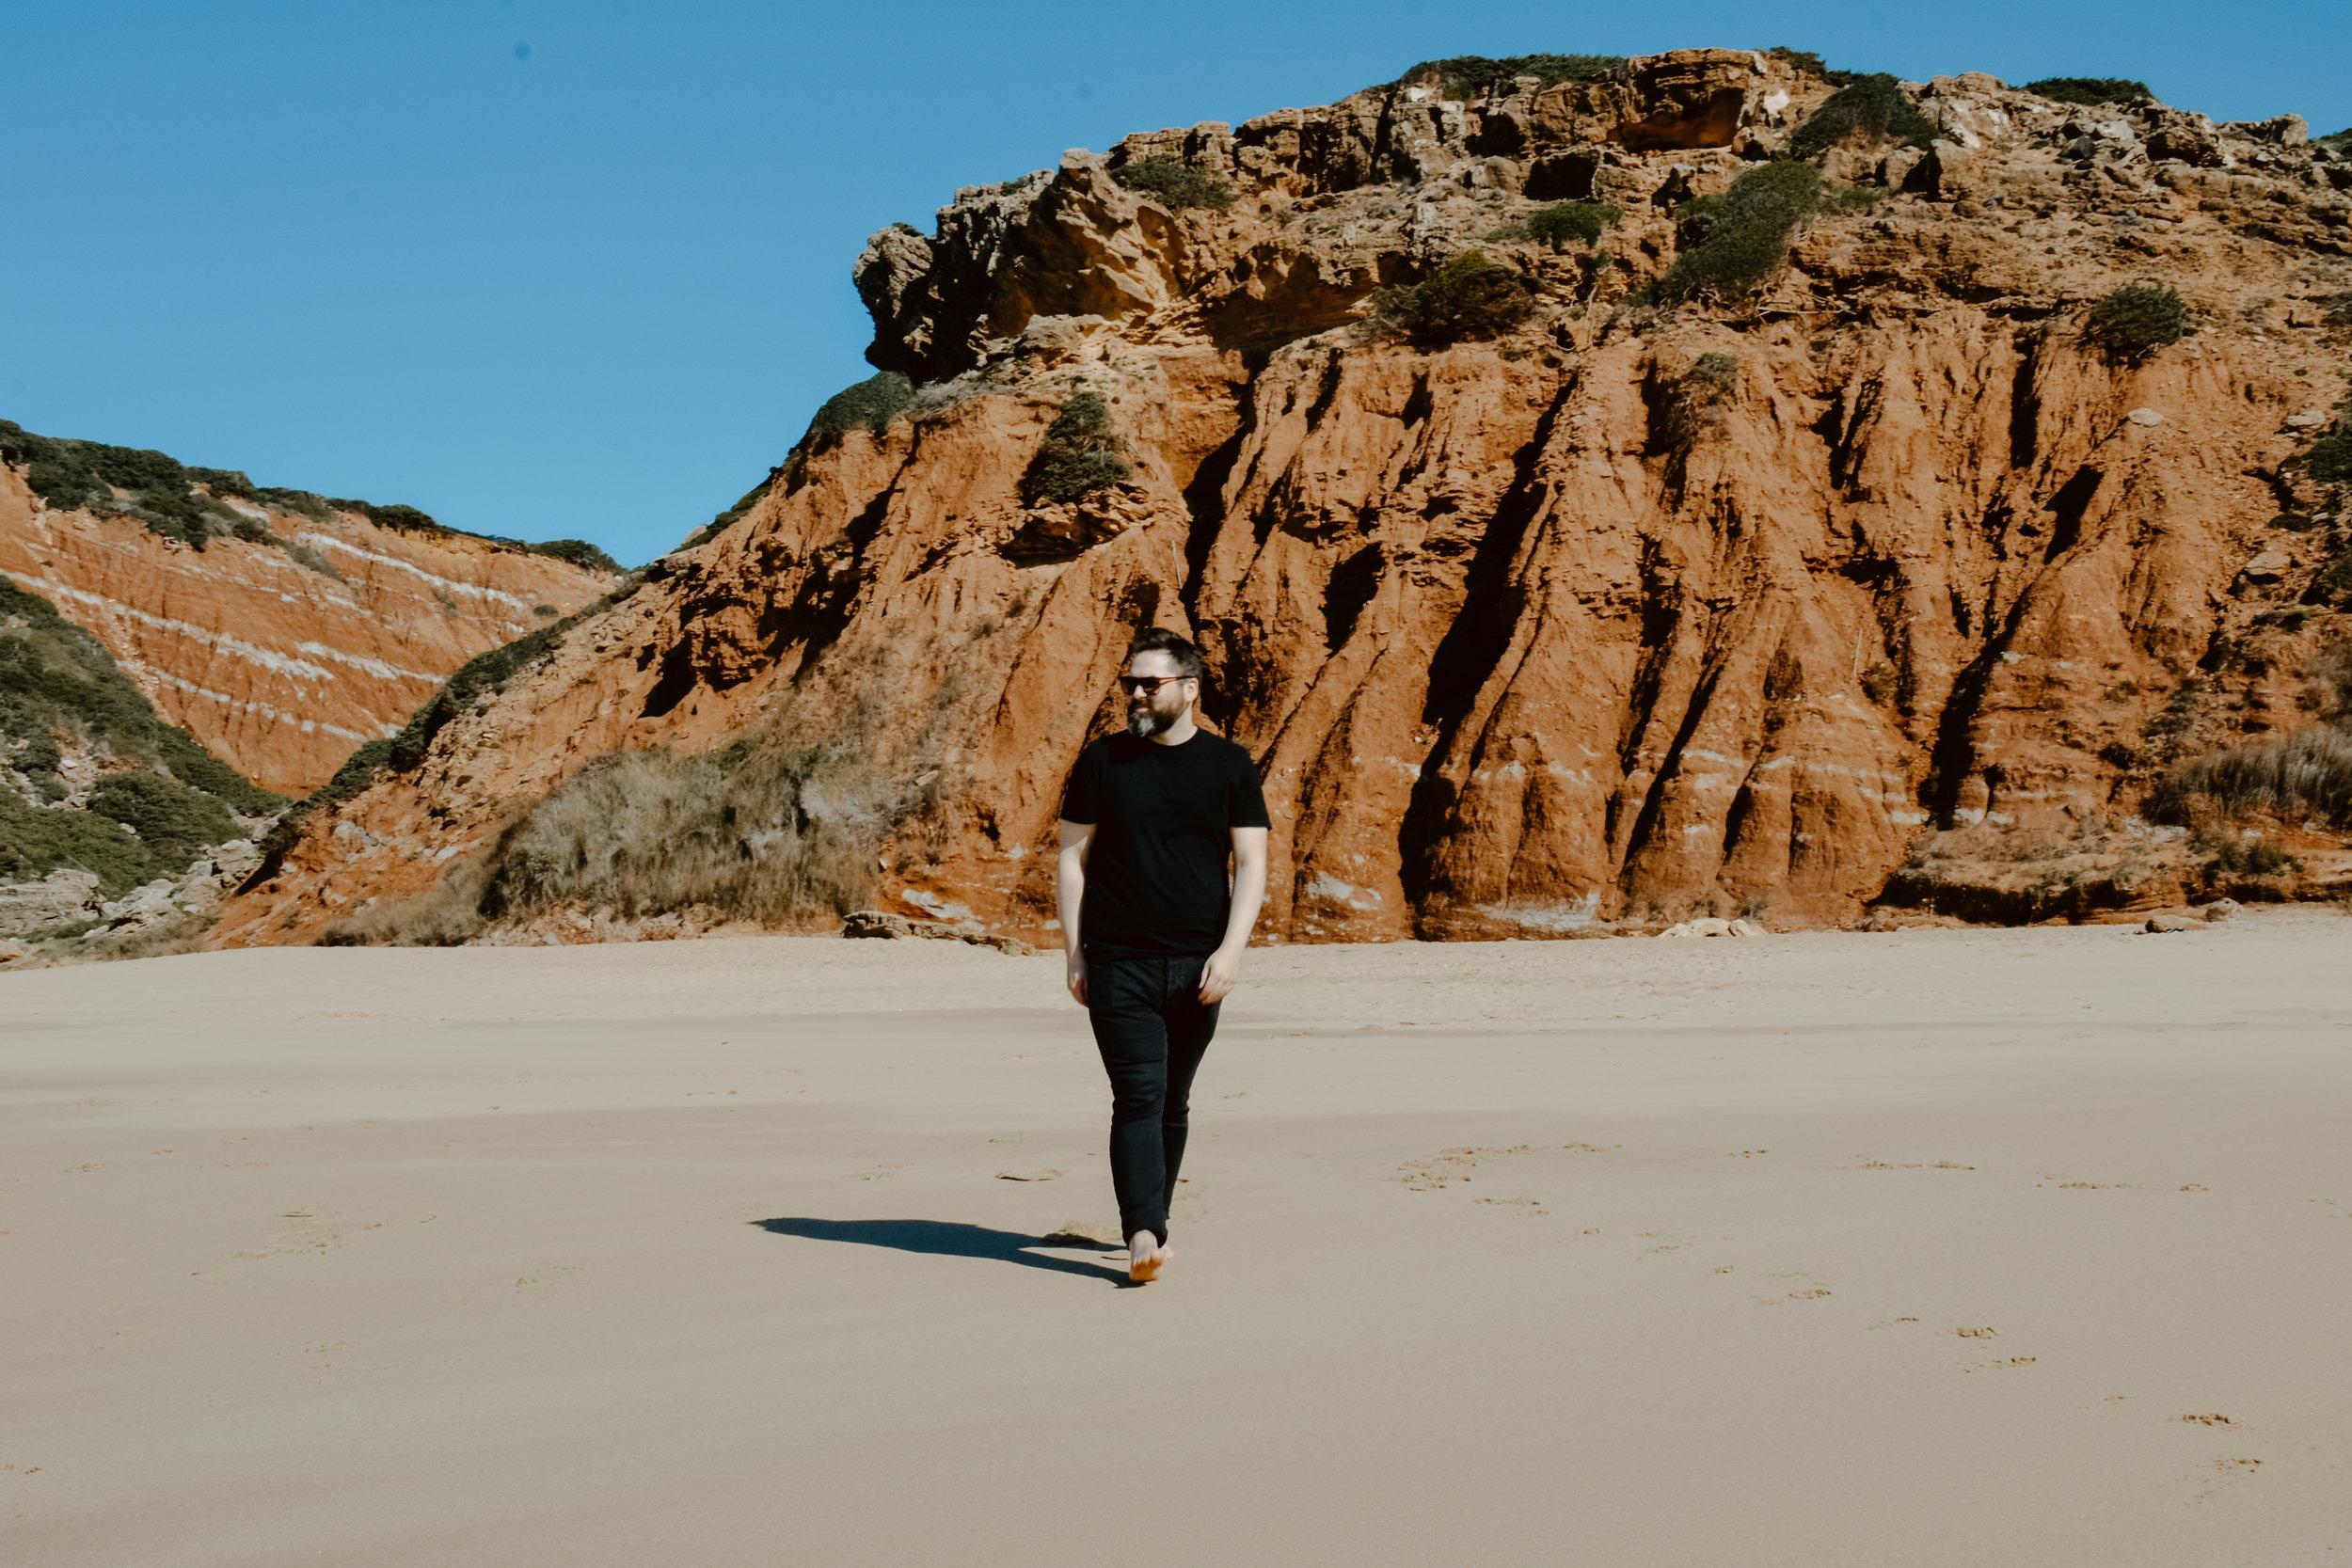 Praia do Telheiro rock formations